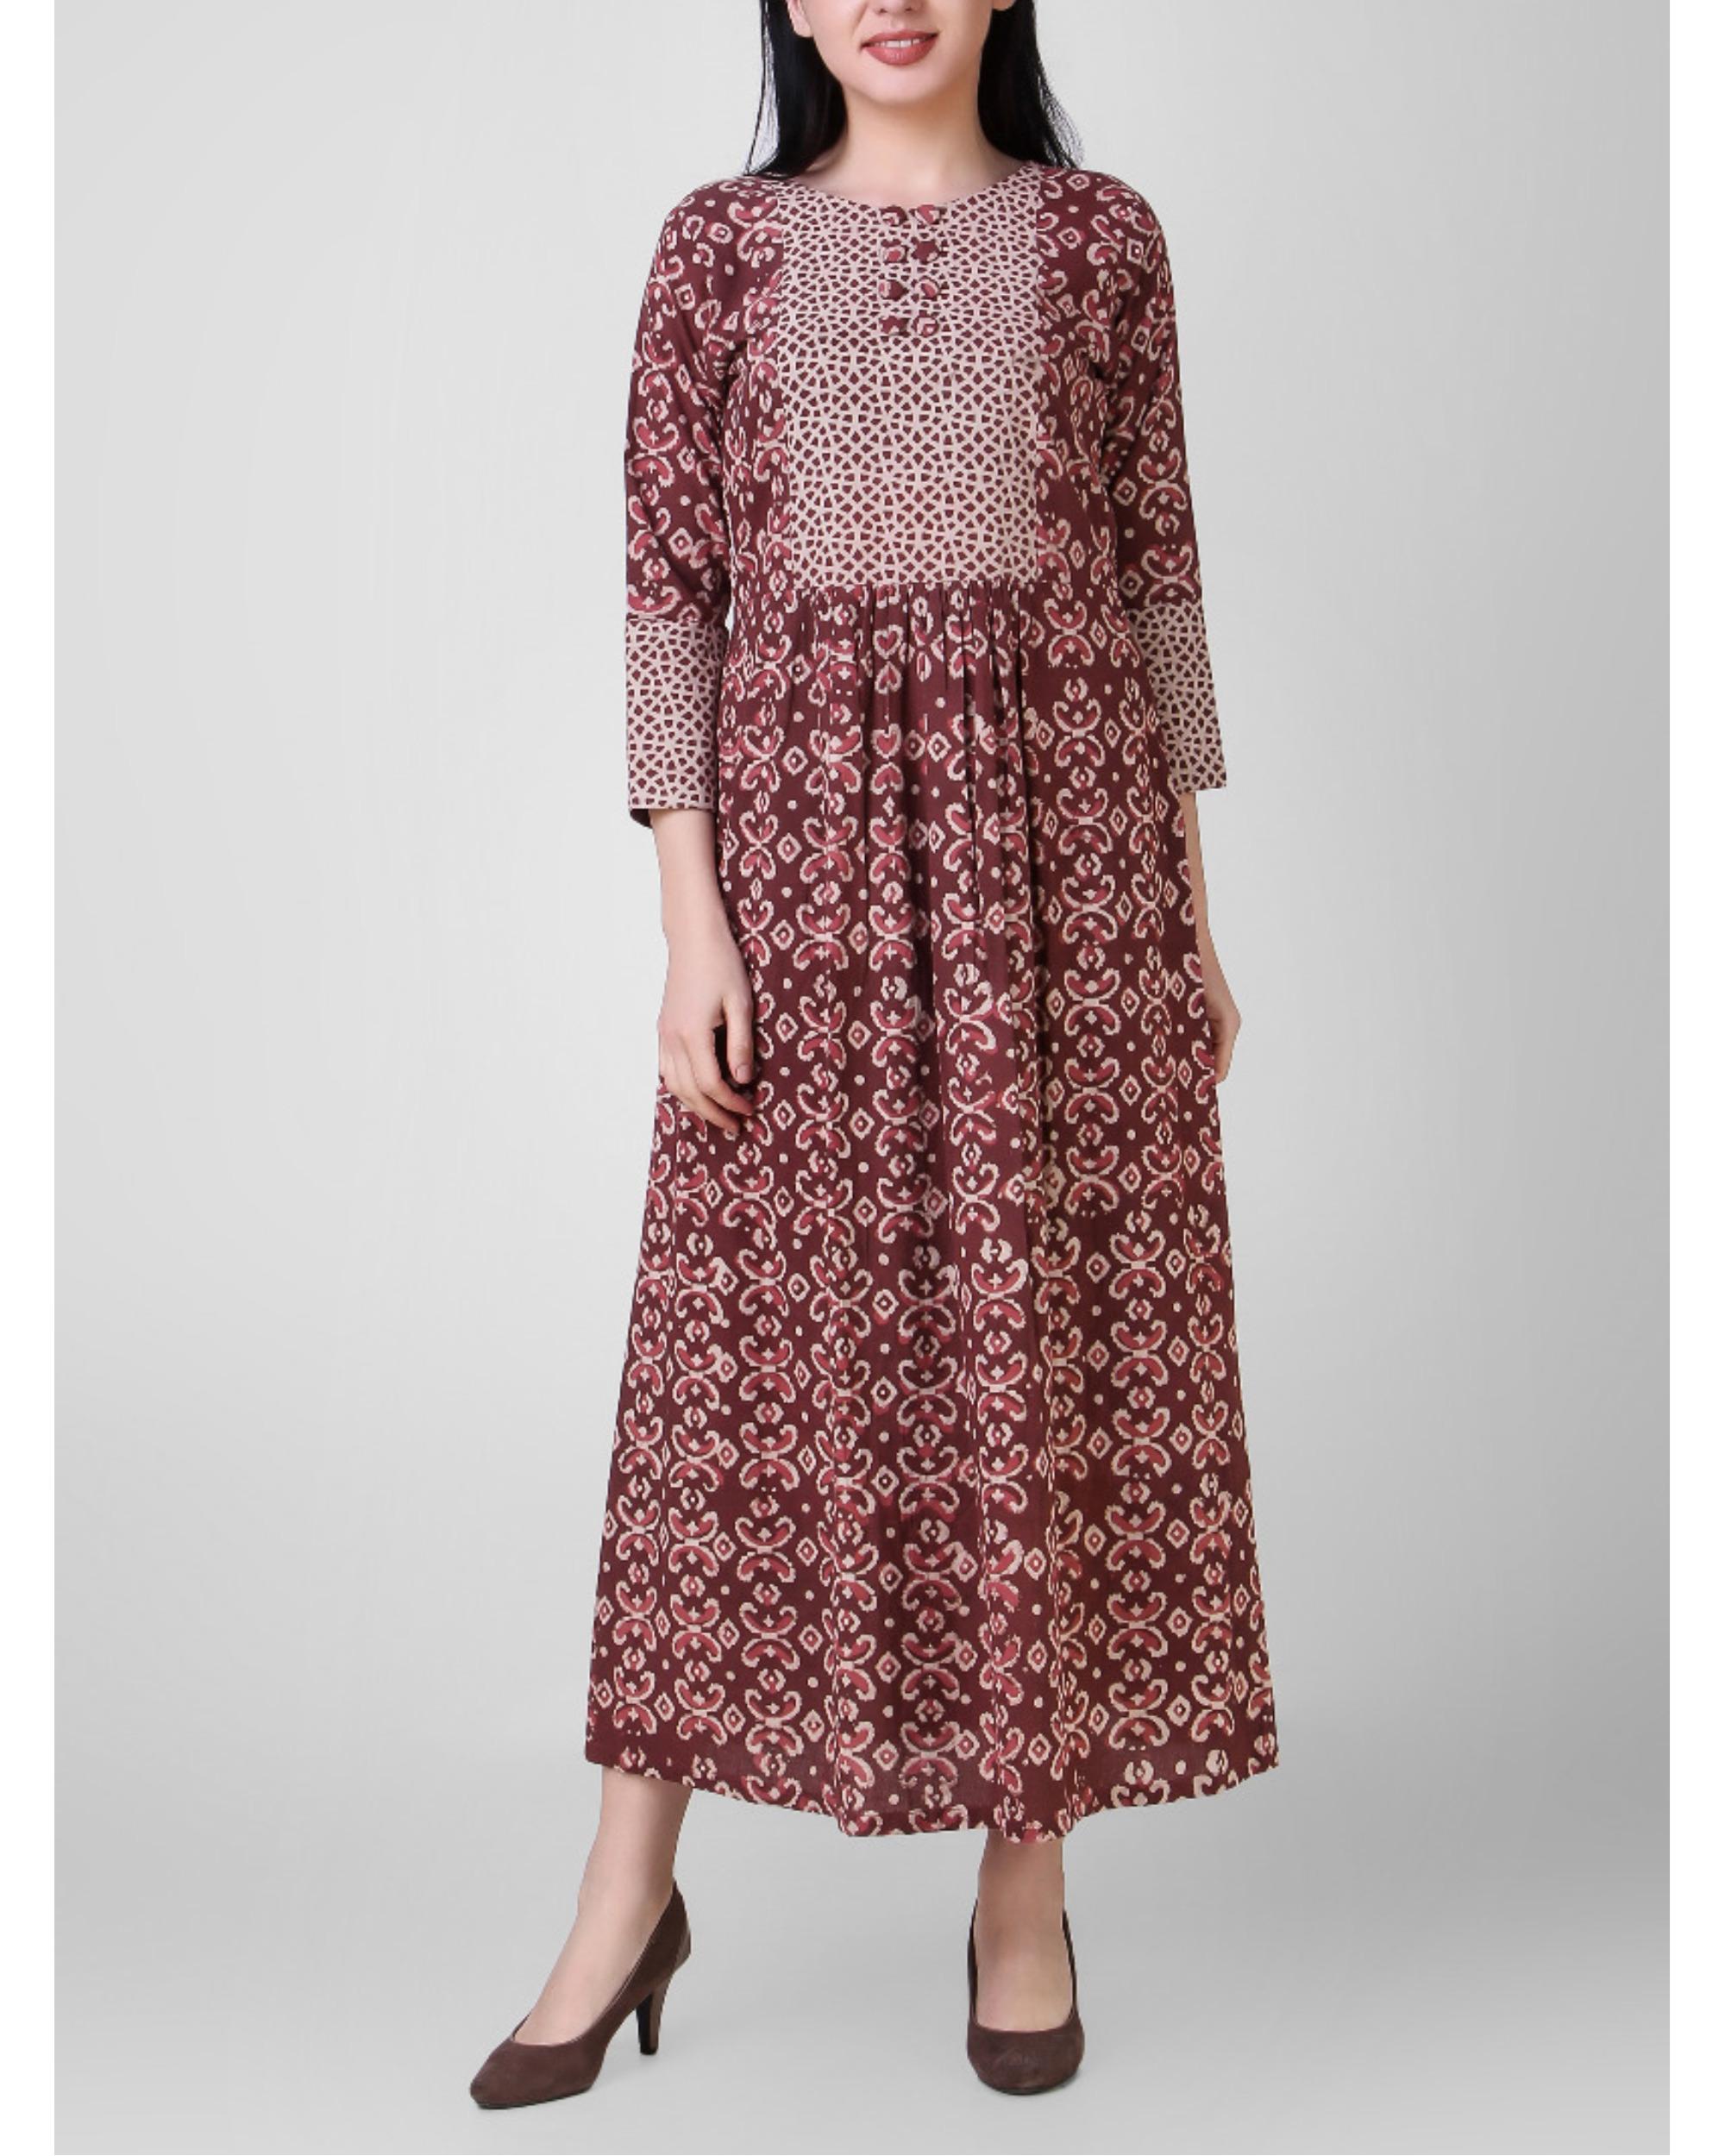 Rust dabu-printed cotton dress